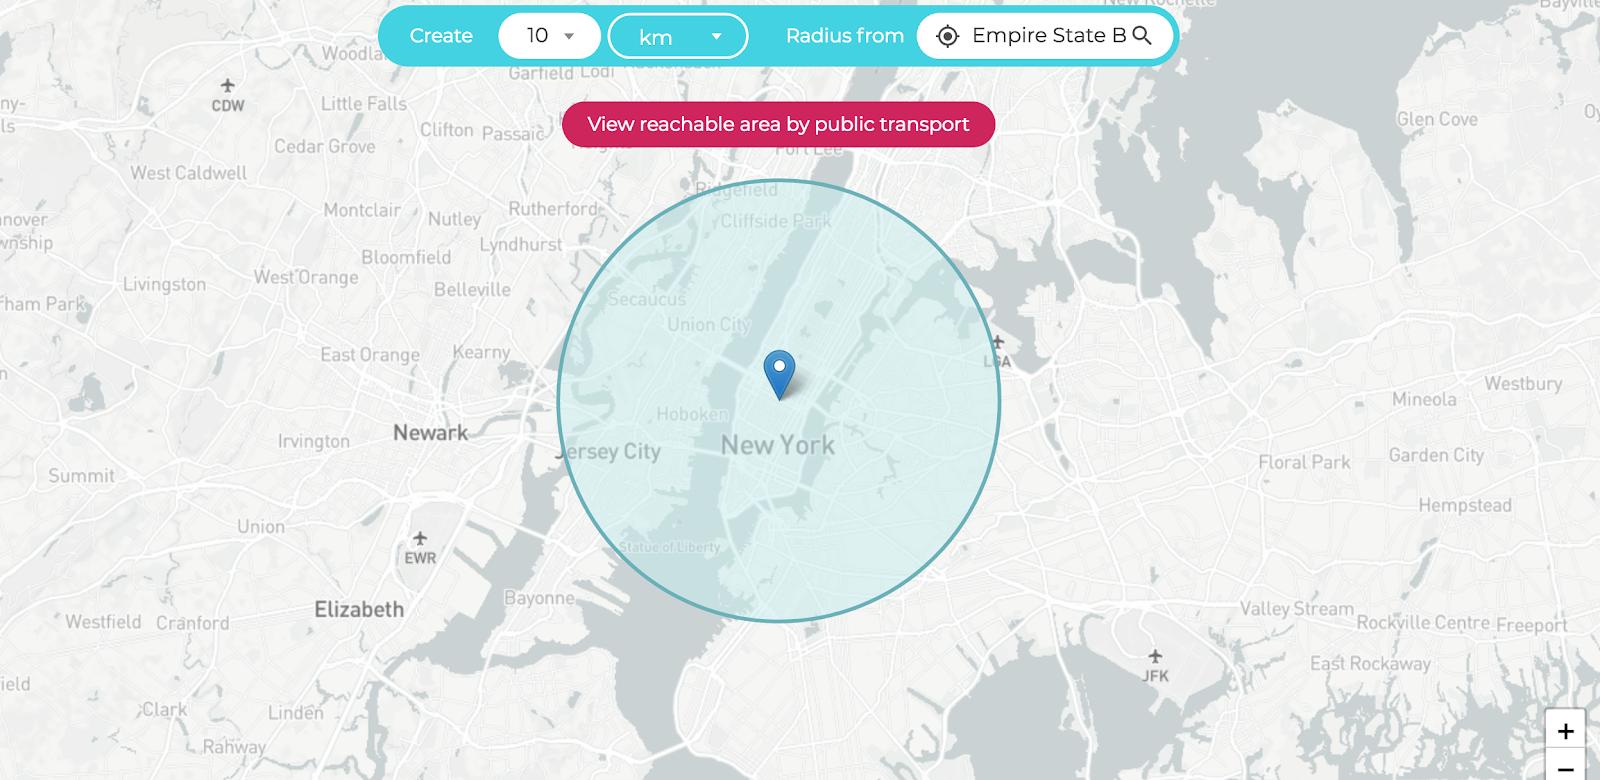 radius-map